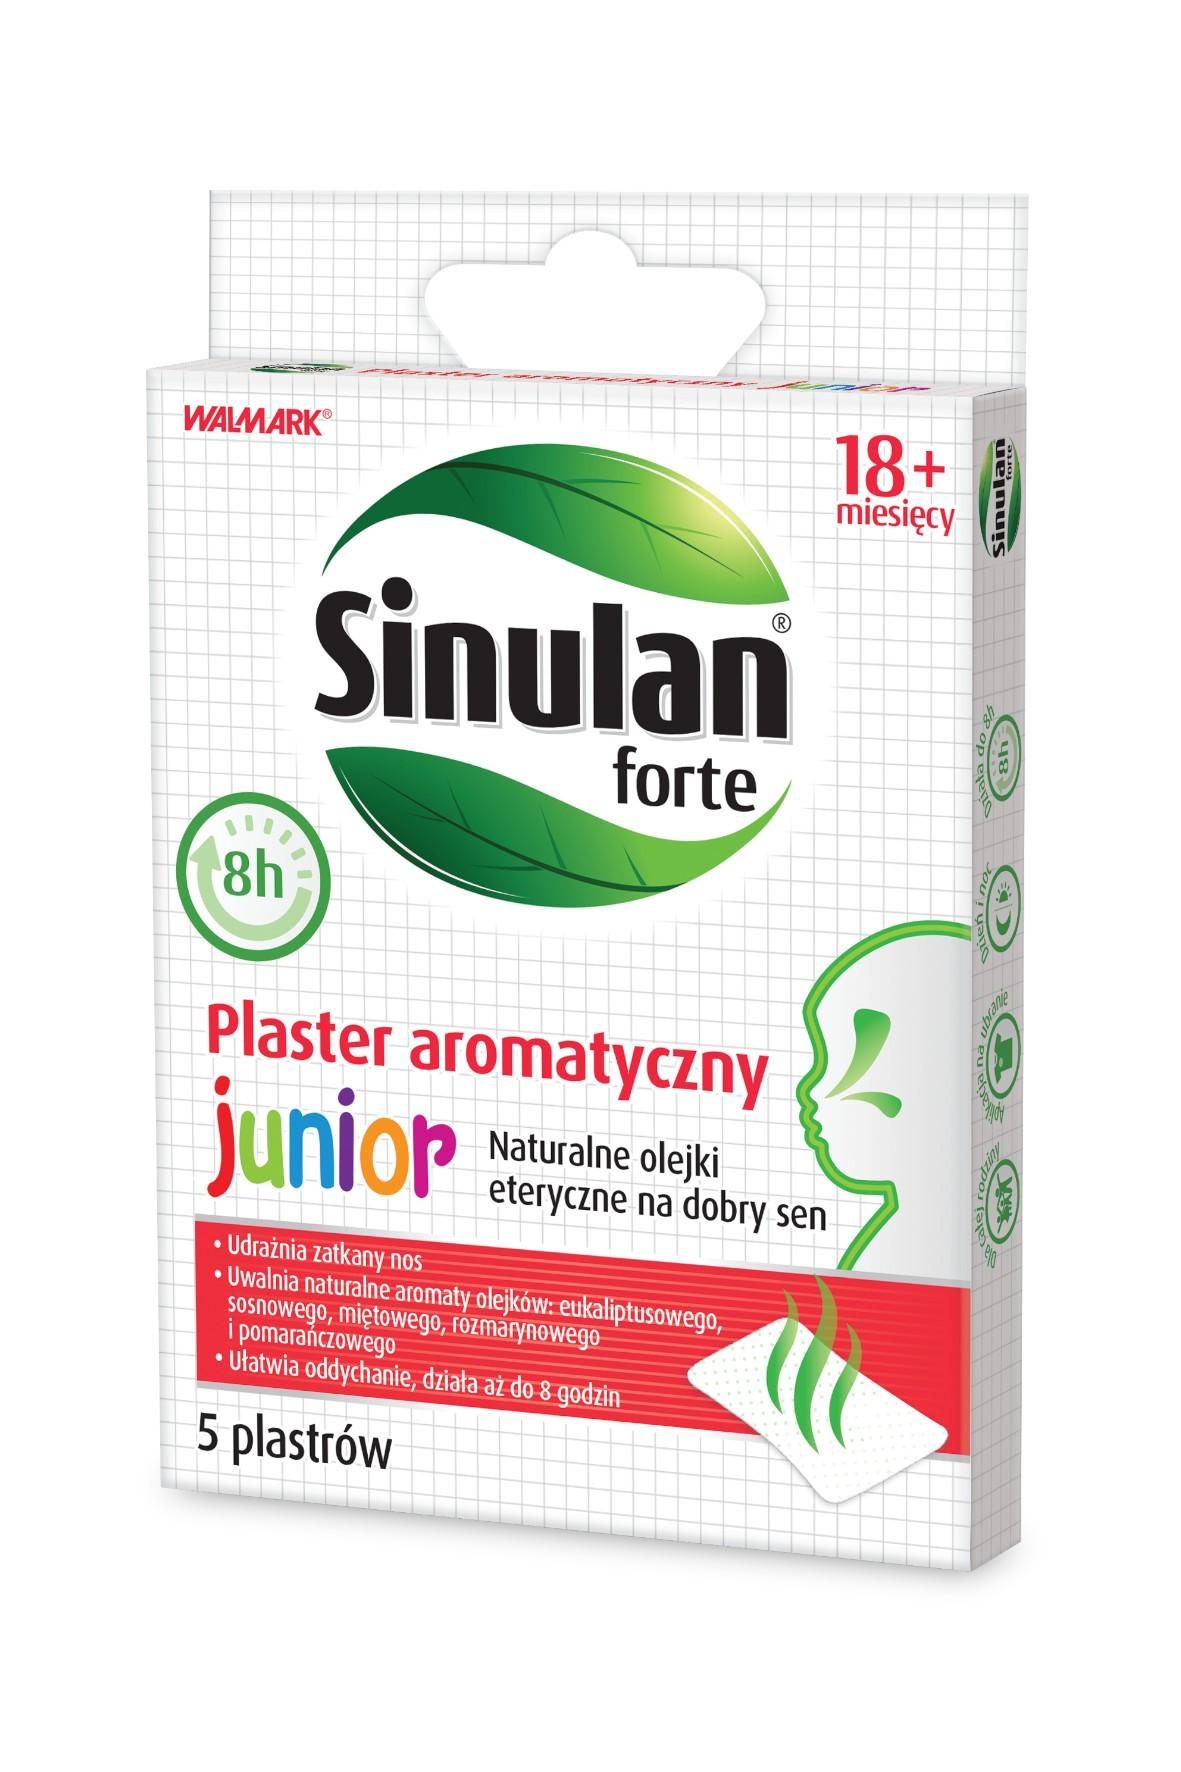 Sinulan forte aroma plaster wiek 18msc+- 5 sztuk